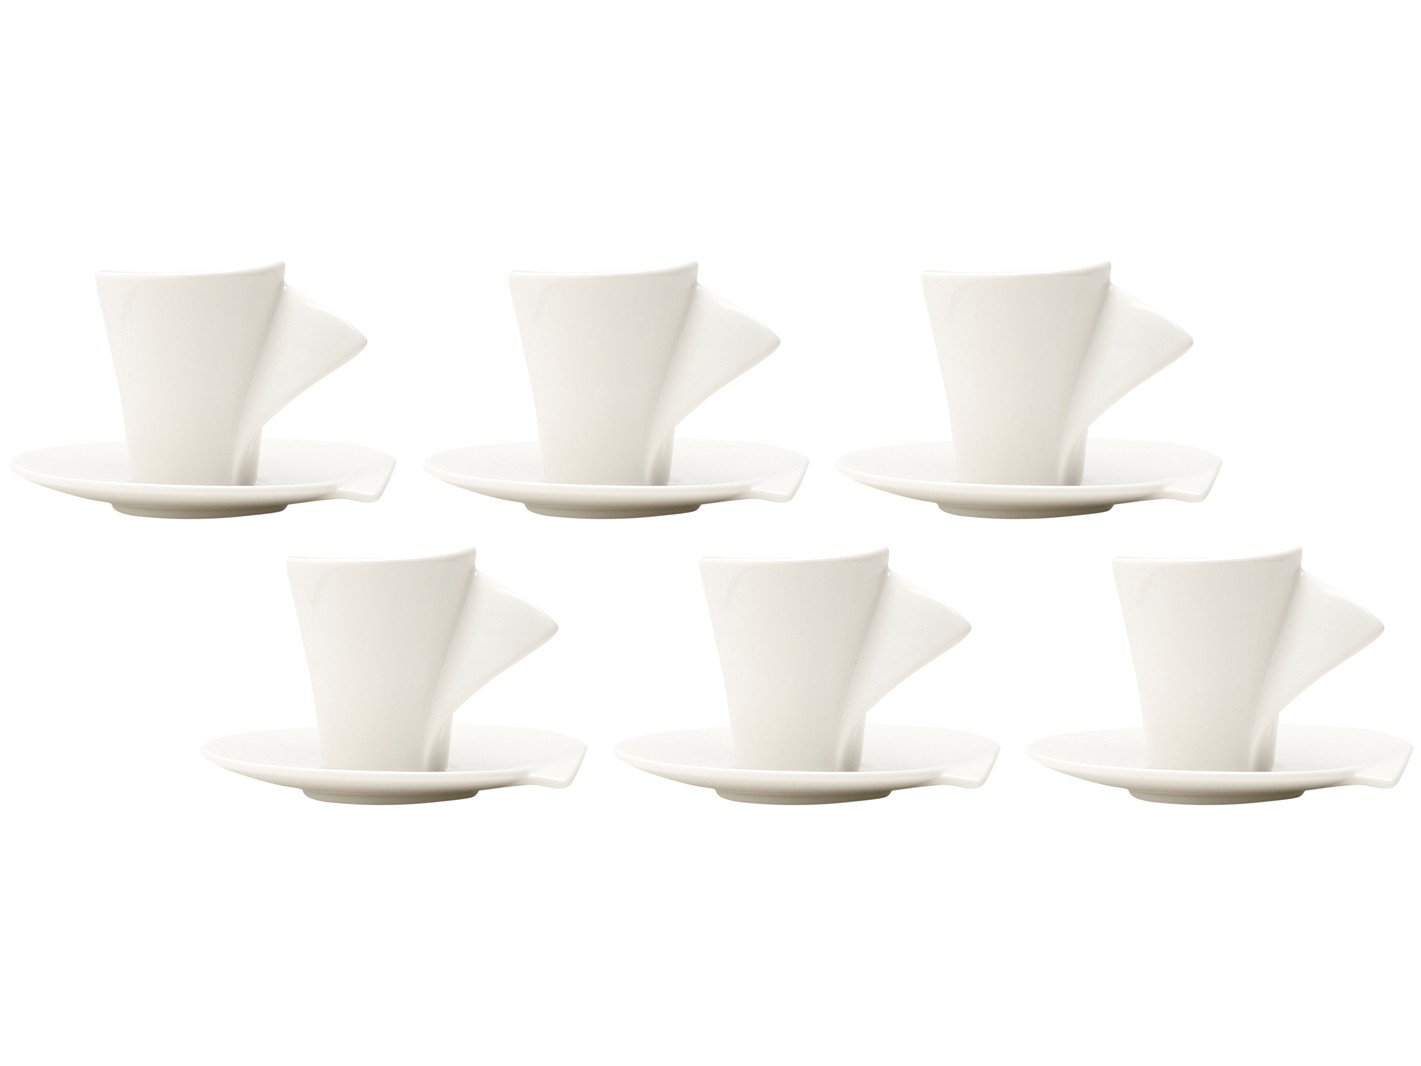 Jogo de Xícaras de Café Porcelana 65ml Wolff - Lyon 6 Peças